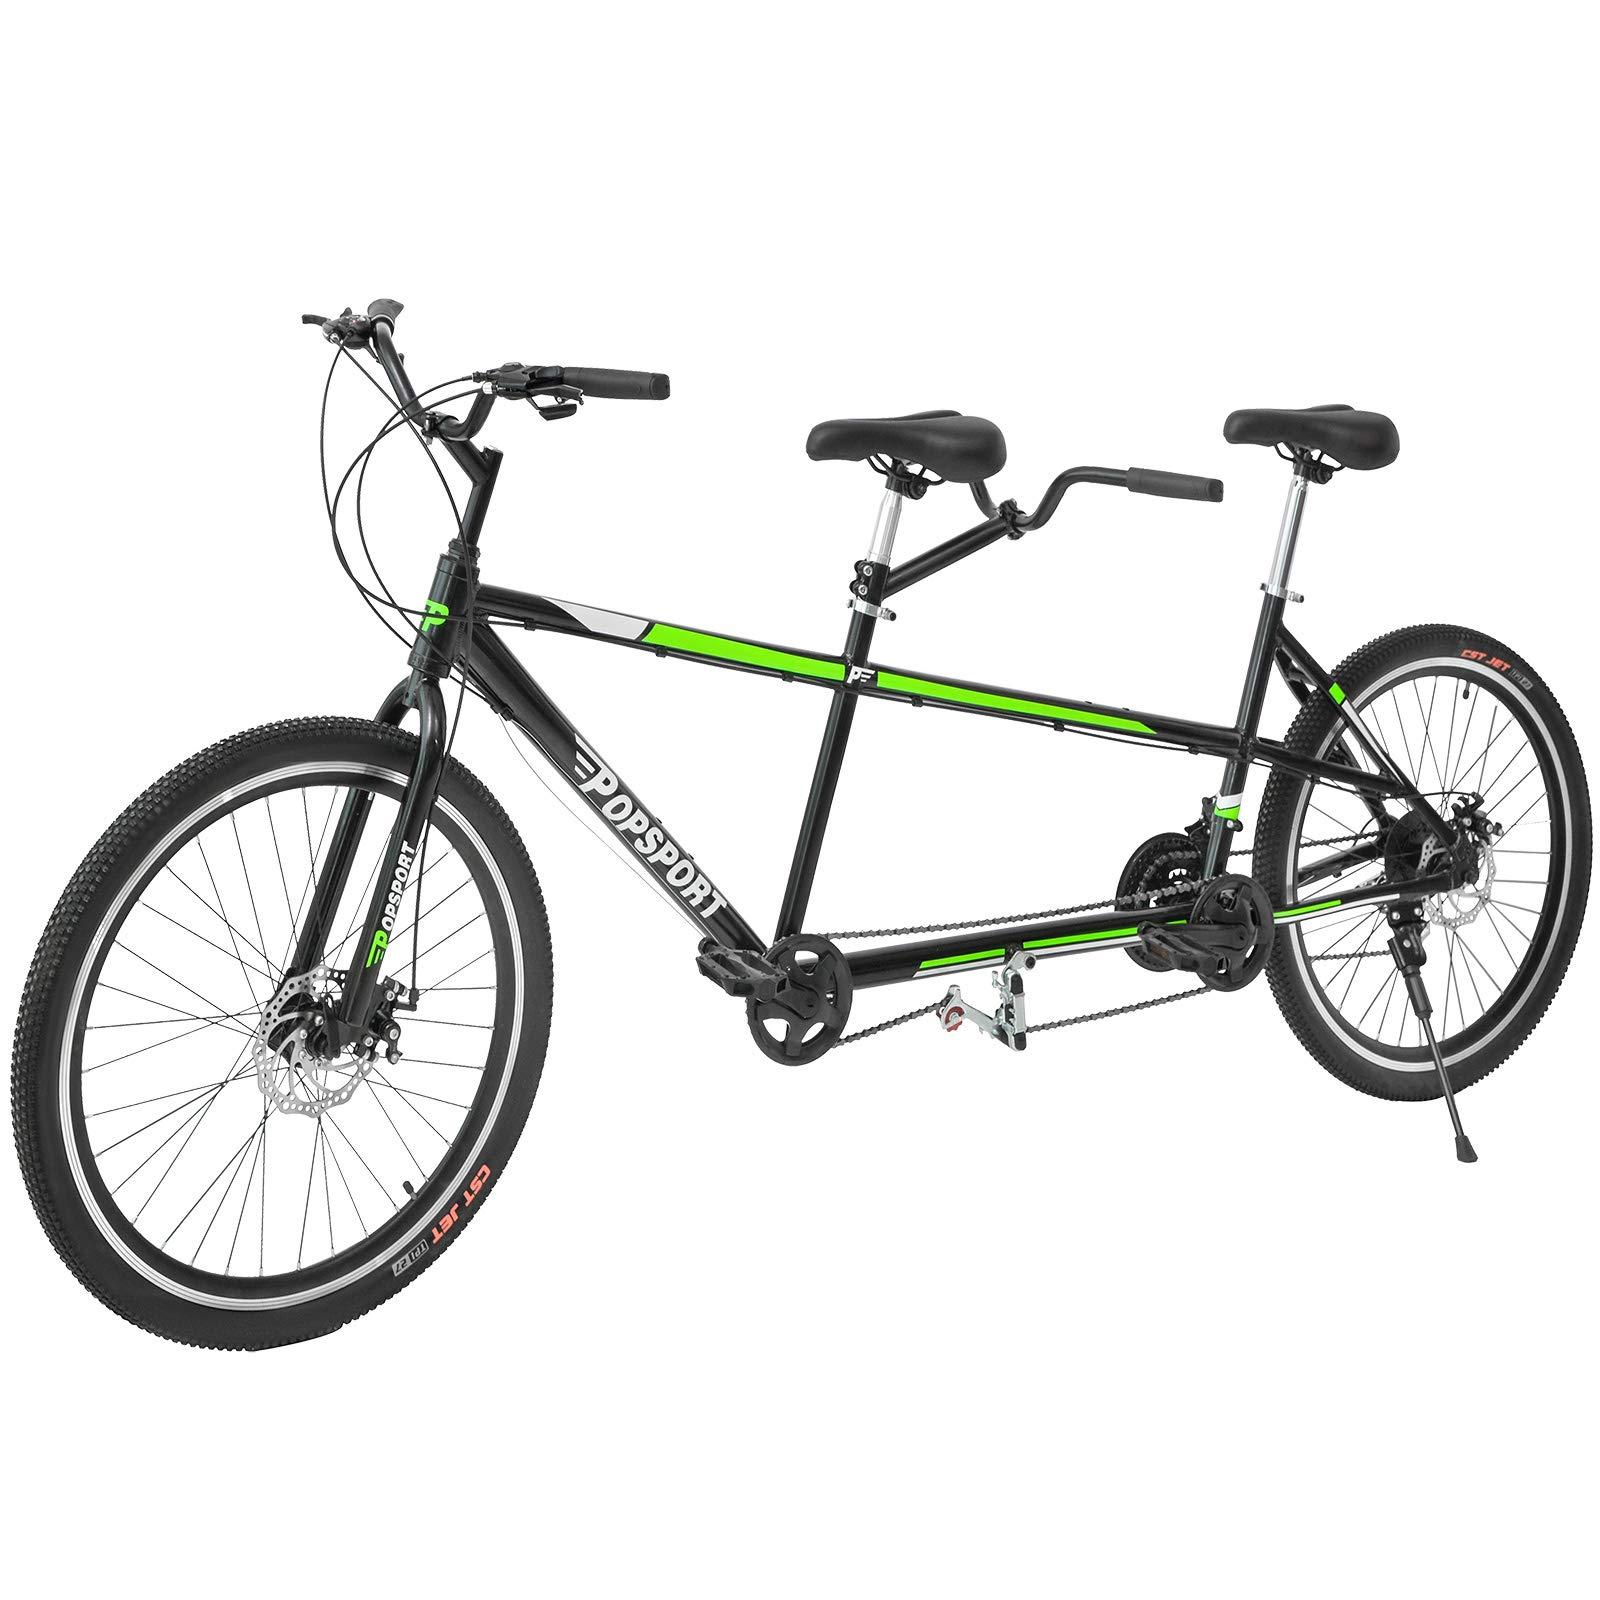 Mophorn Dual Drive Tandem Bike 26 Inch Wheel Aluminium Alloy Twinn Tandem Bicycle 7 Mechanical Disc Brakes (Green) by Mophorn